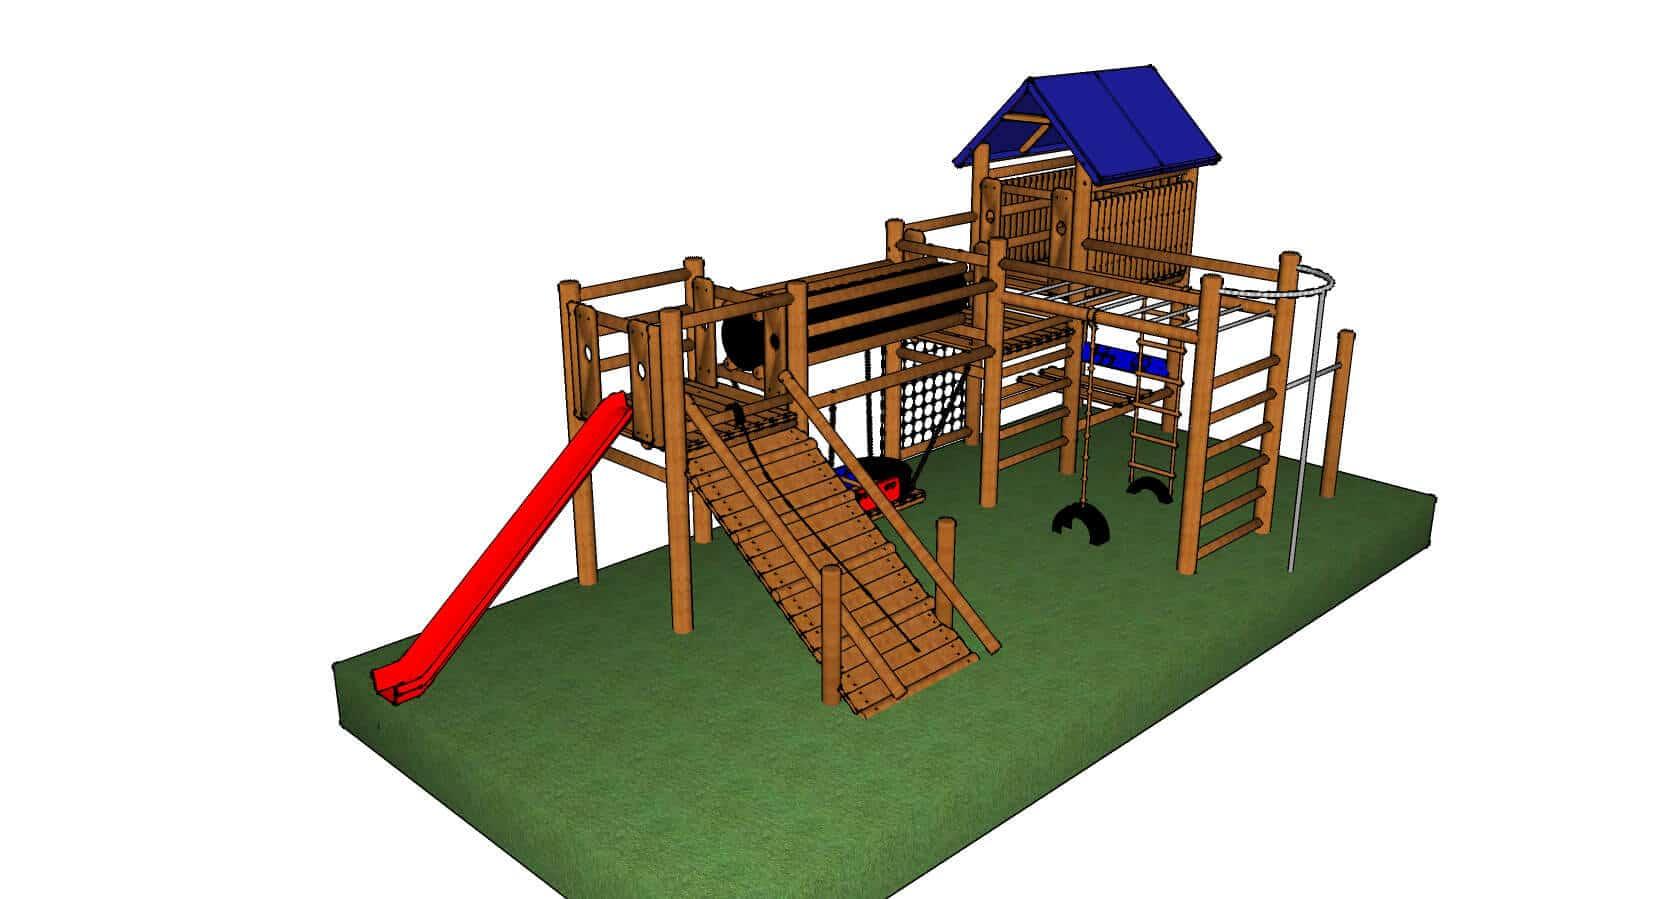 power station 2 outdoor kids playground equipment kidbuddie. Black Bedroom Furniture Sets. Home Design Ideas